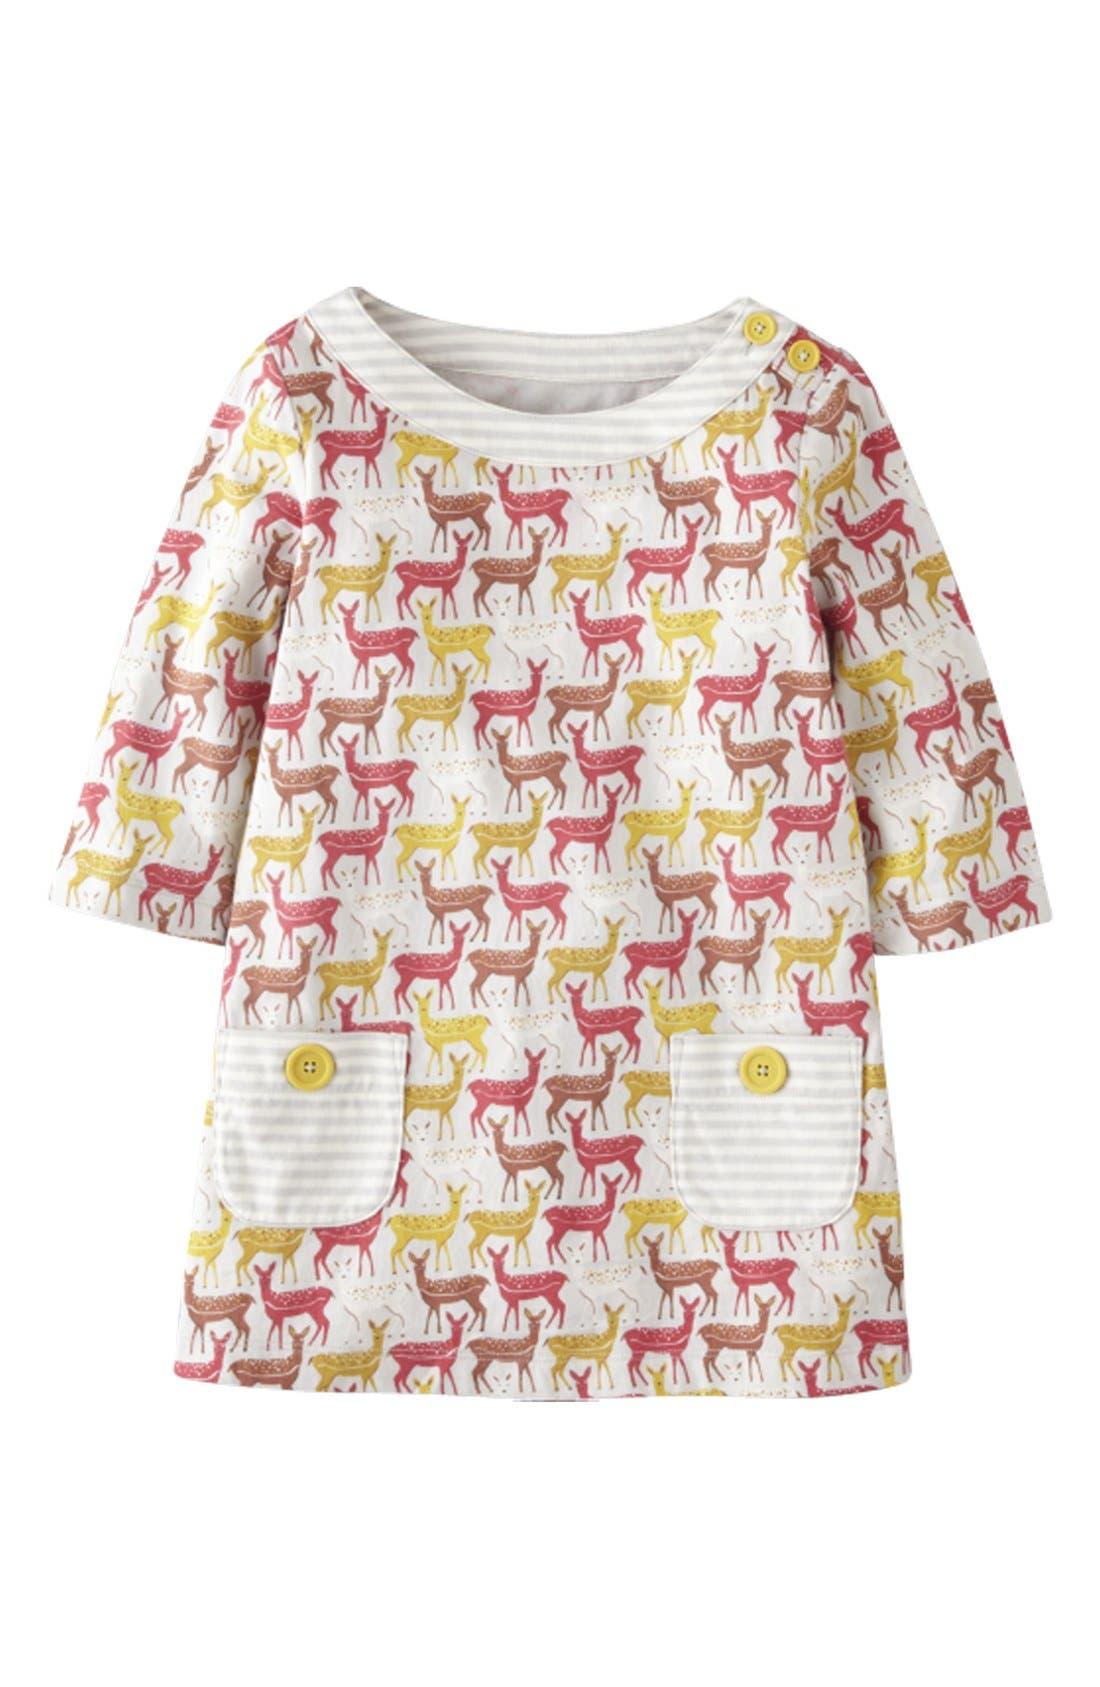 Alternate Image 1 Selected - Mini Boden Print Tunic Top (Toddler Girls)